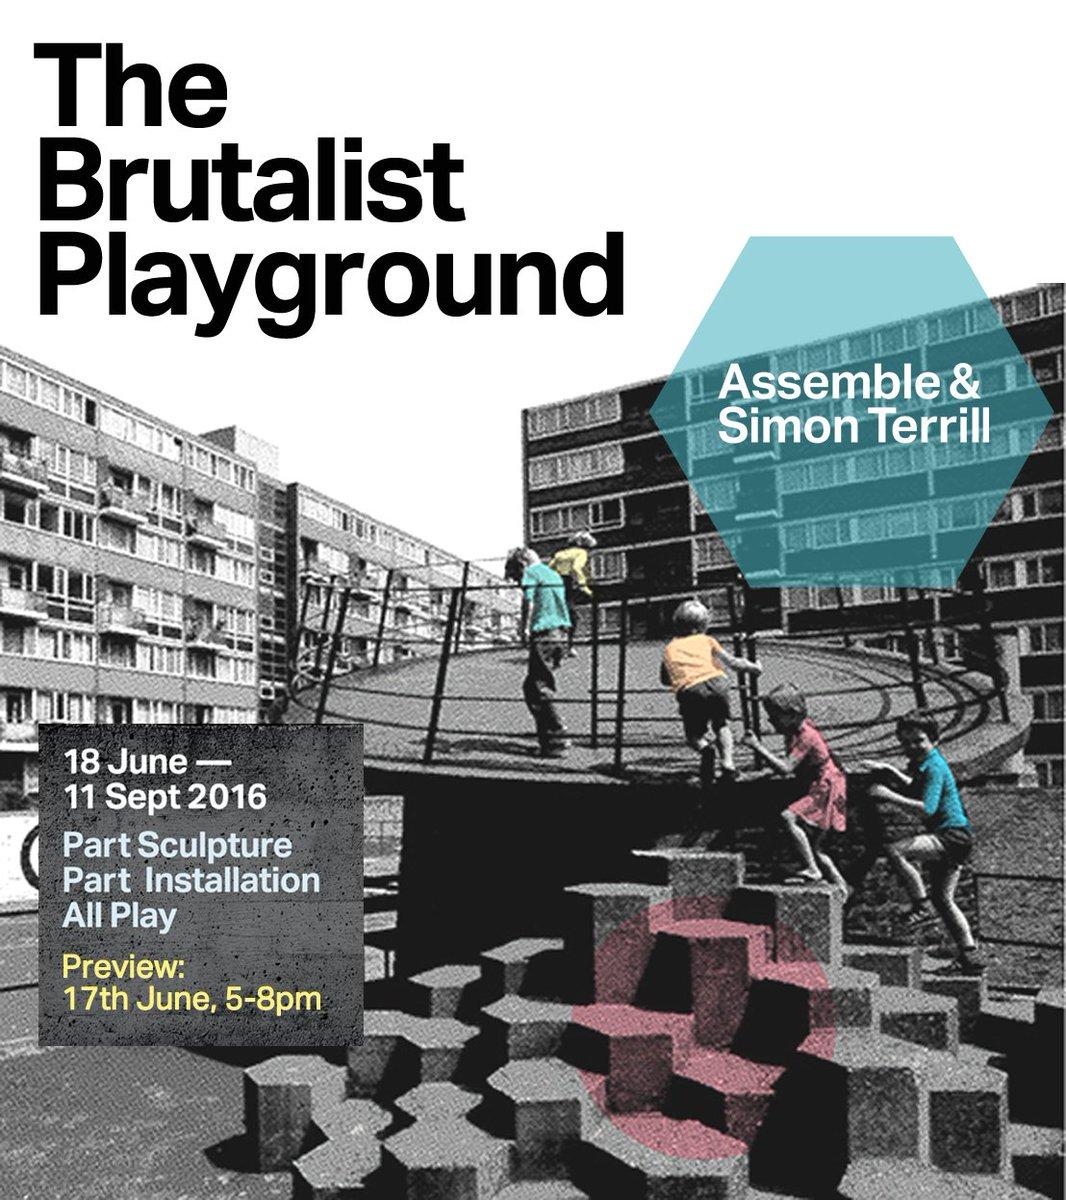 #BrutalistPlayground by Assemble & Simon Terrill opens @S1Artspace at Park Hill Sat 18 June. Part of @YorkshireFest https://t.co/m1ZrNuCKj3